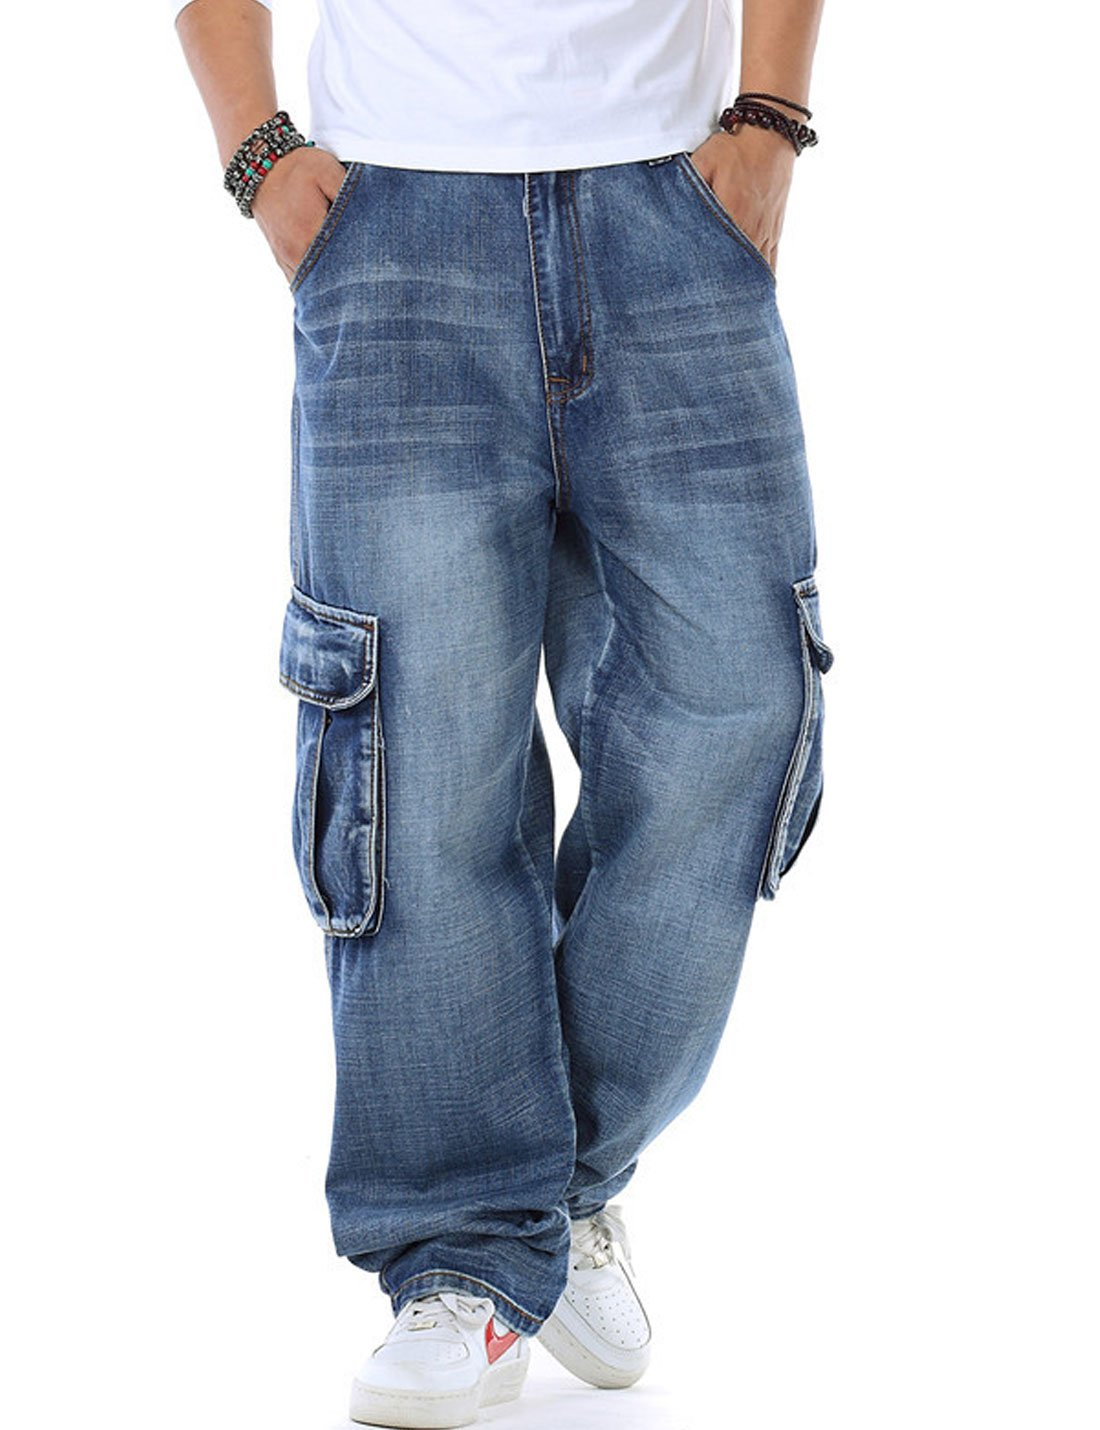 Mens Hip-hop Blue Casual Multi-pocket loose denim shorts Cropped jeans Plus Size